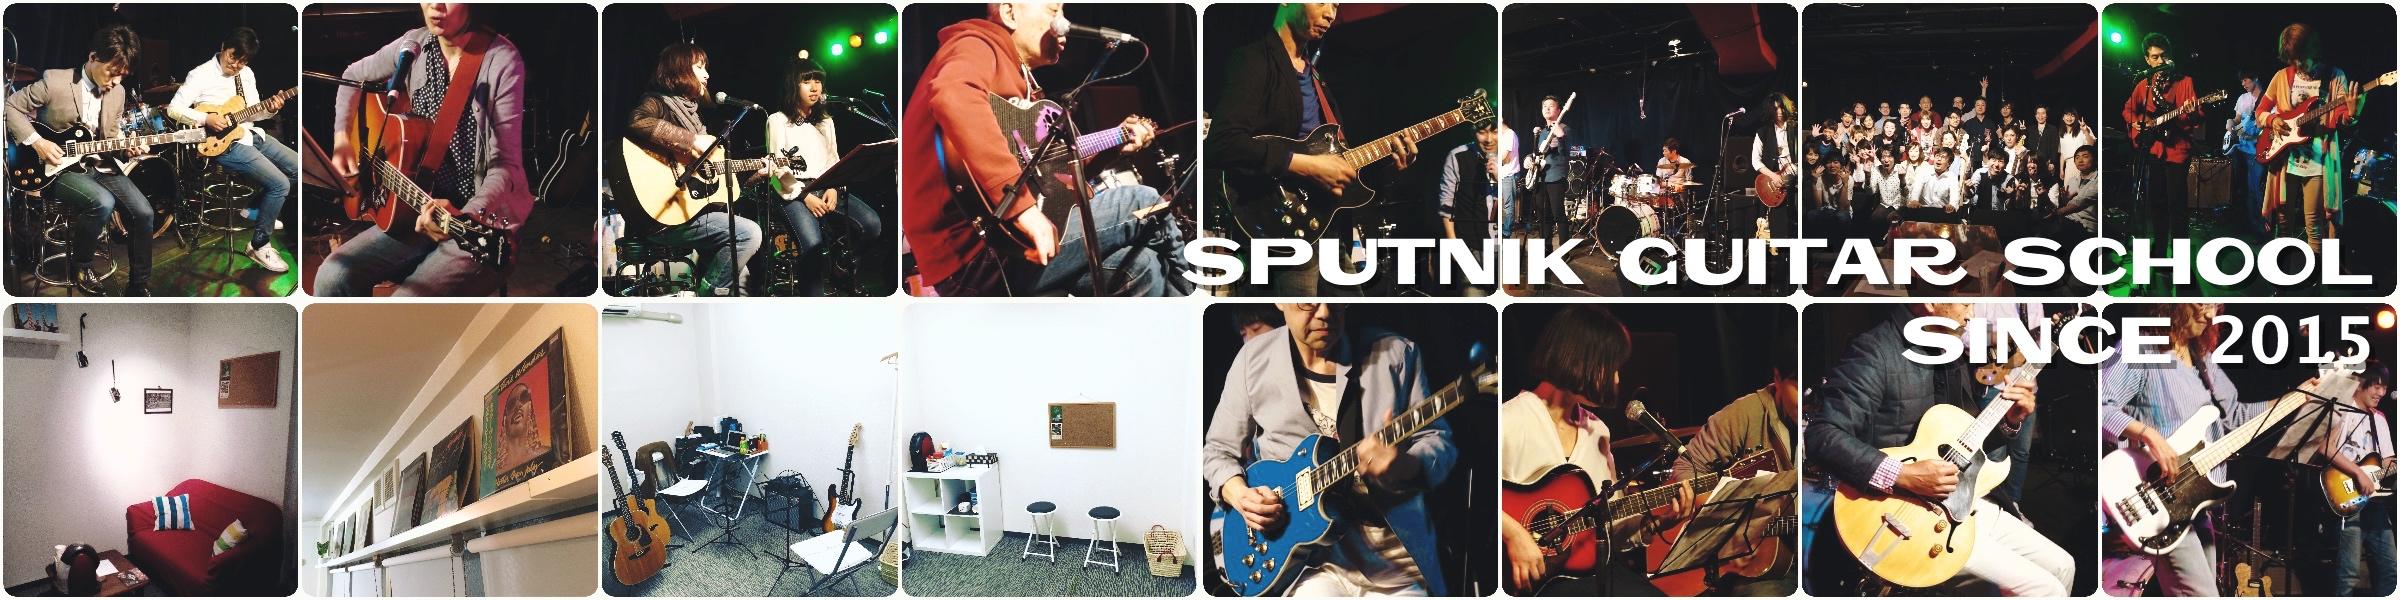 Sputnik Guitar School(大阪市 本町 ギター教室 ベース教室)